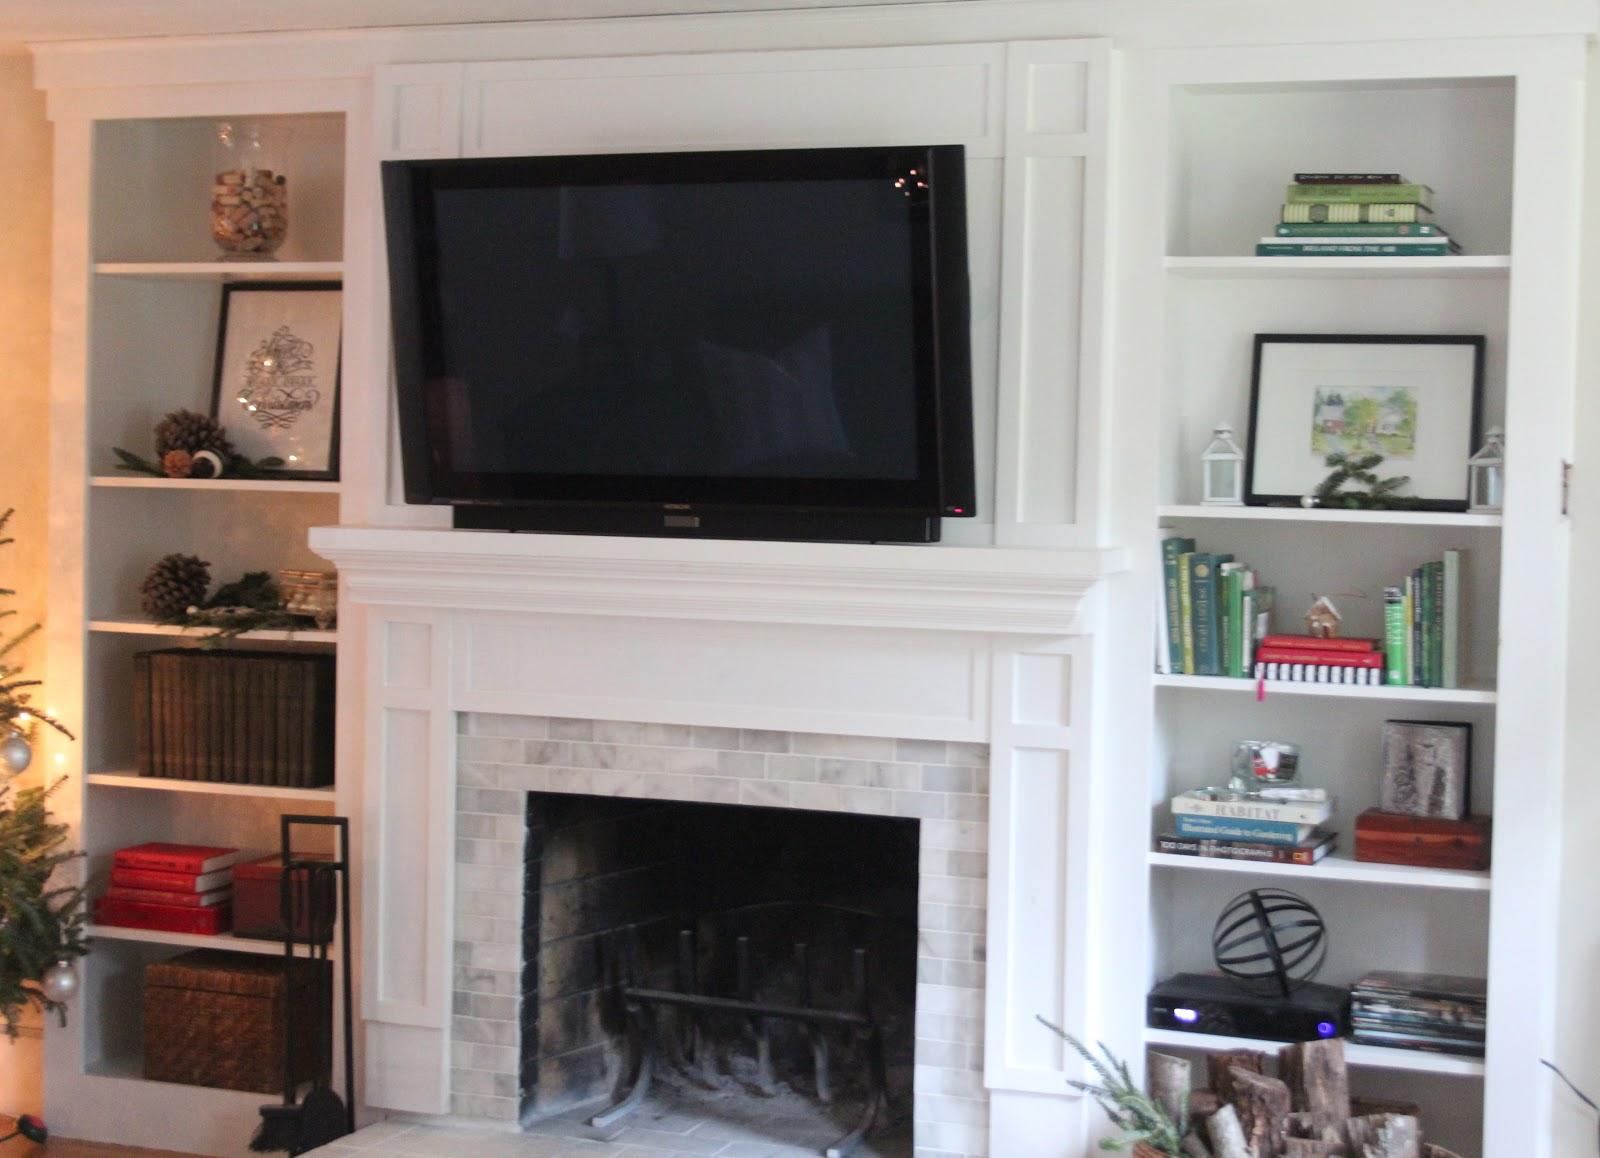 fa la la fireplace remodel in progress shine your light